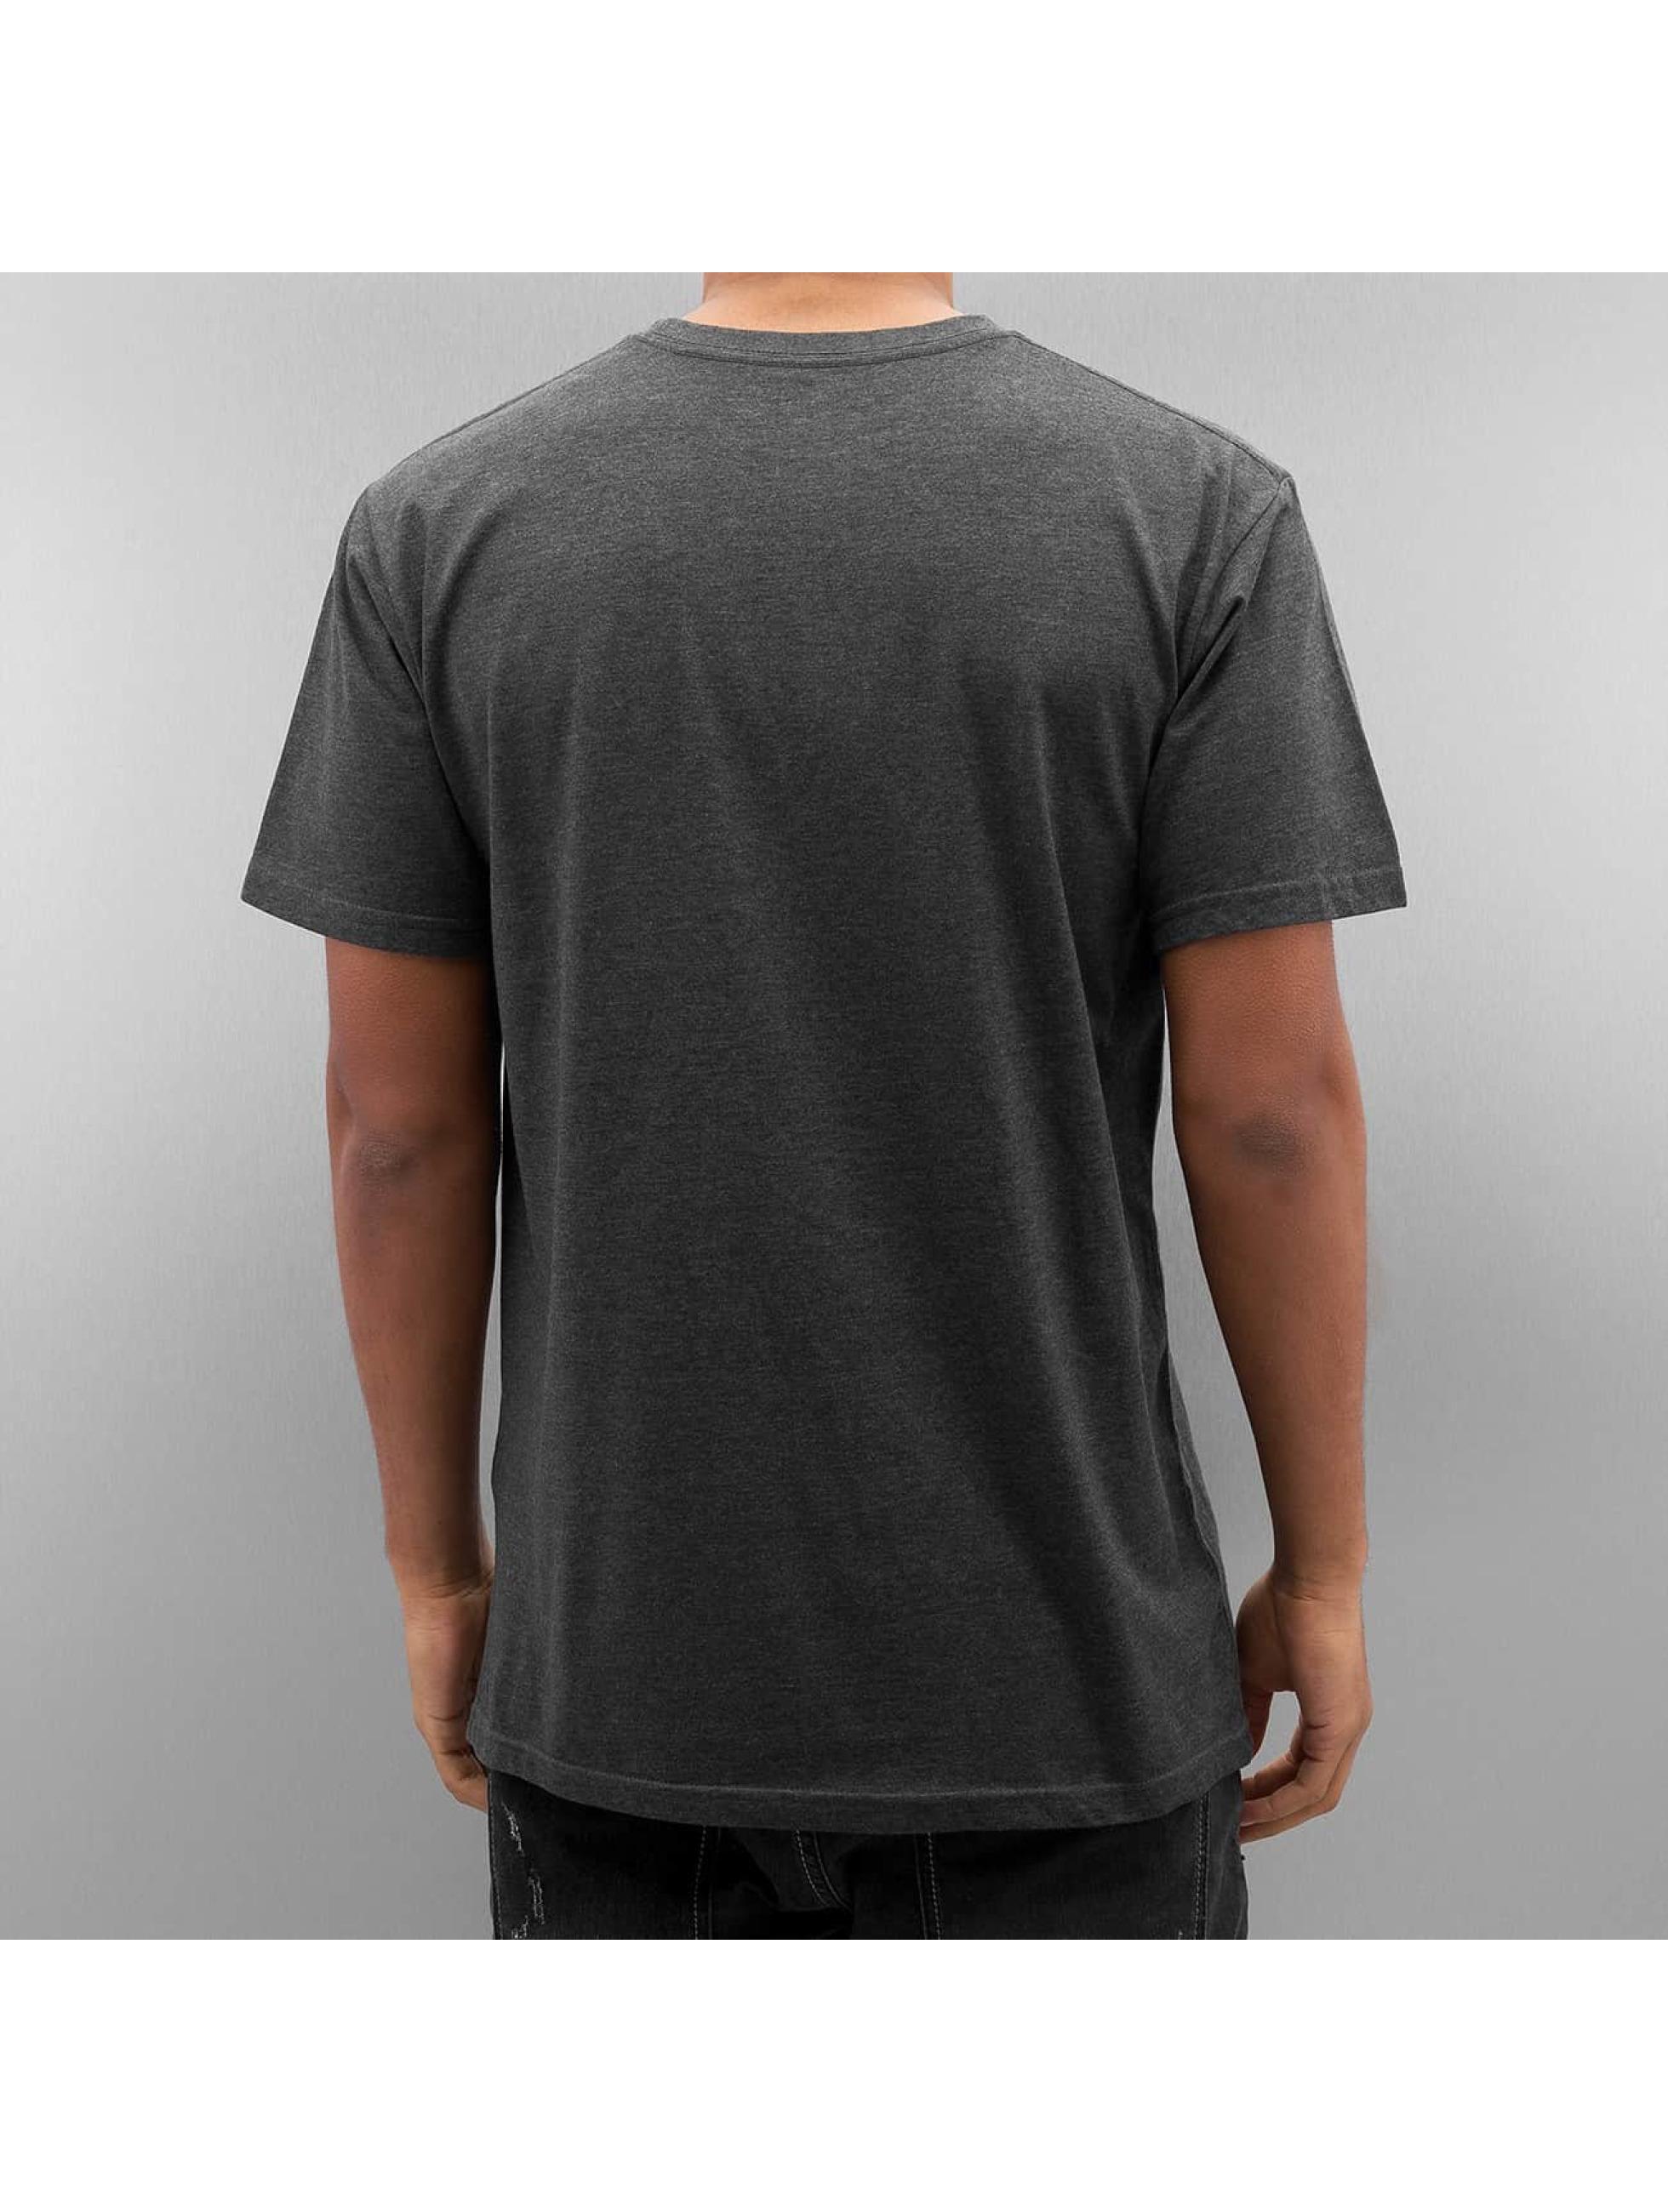 Quiksilver T-Shirt Double Lines Heather grey